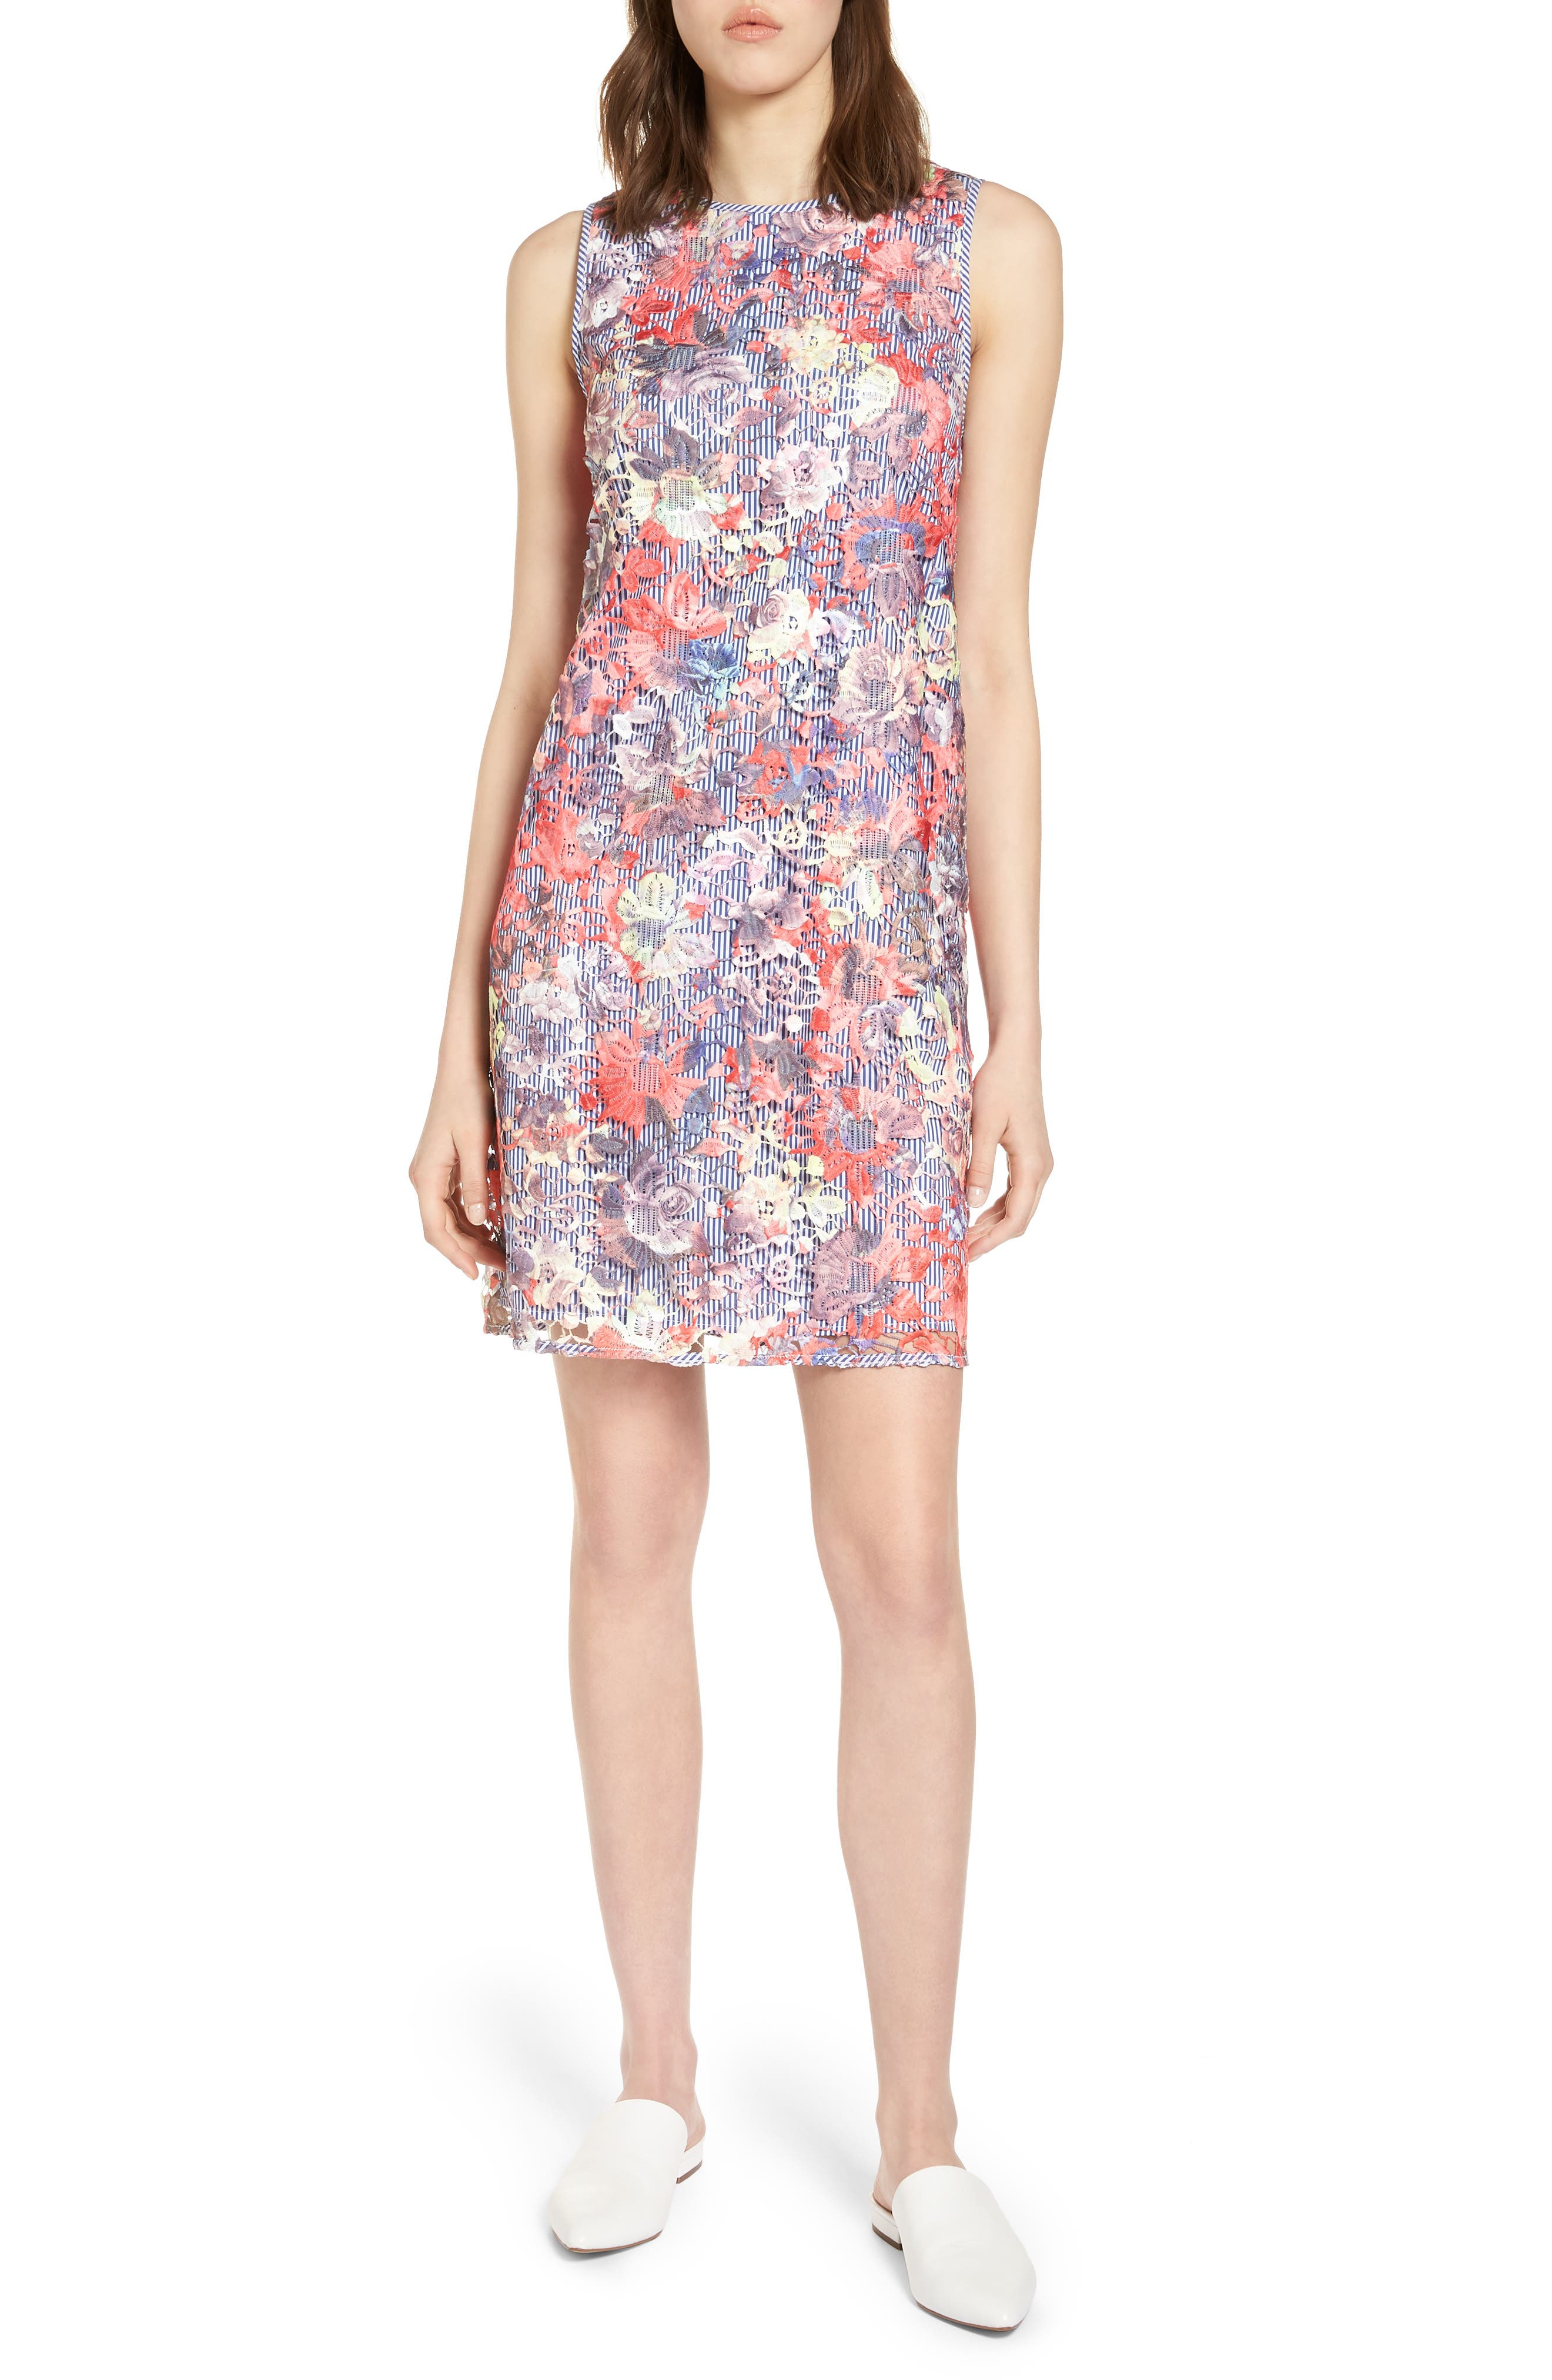 Lace Pinstripe Tank Dress,                             Main thumbnail 1, color,                             Coral Lace Pattern